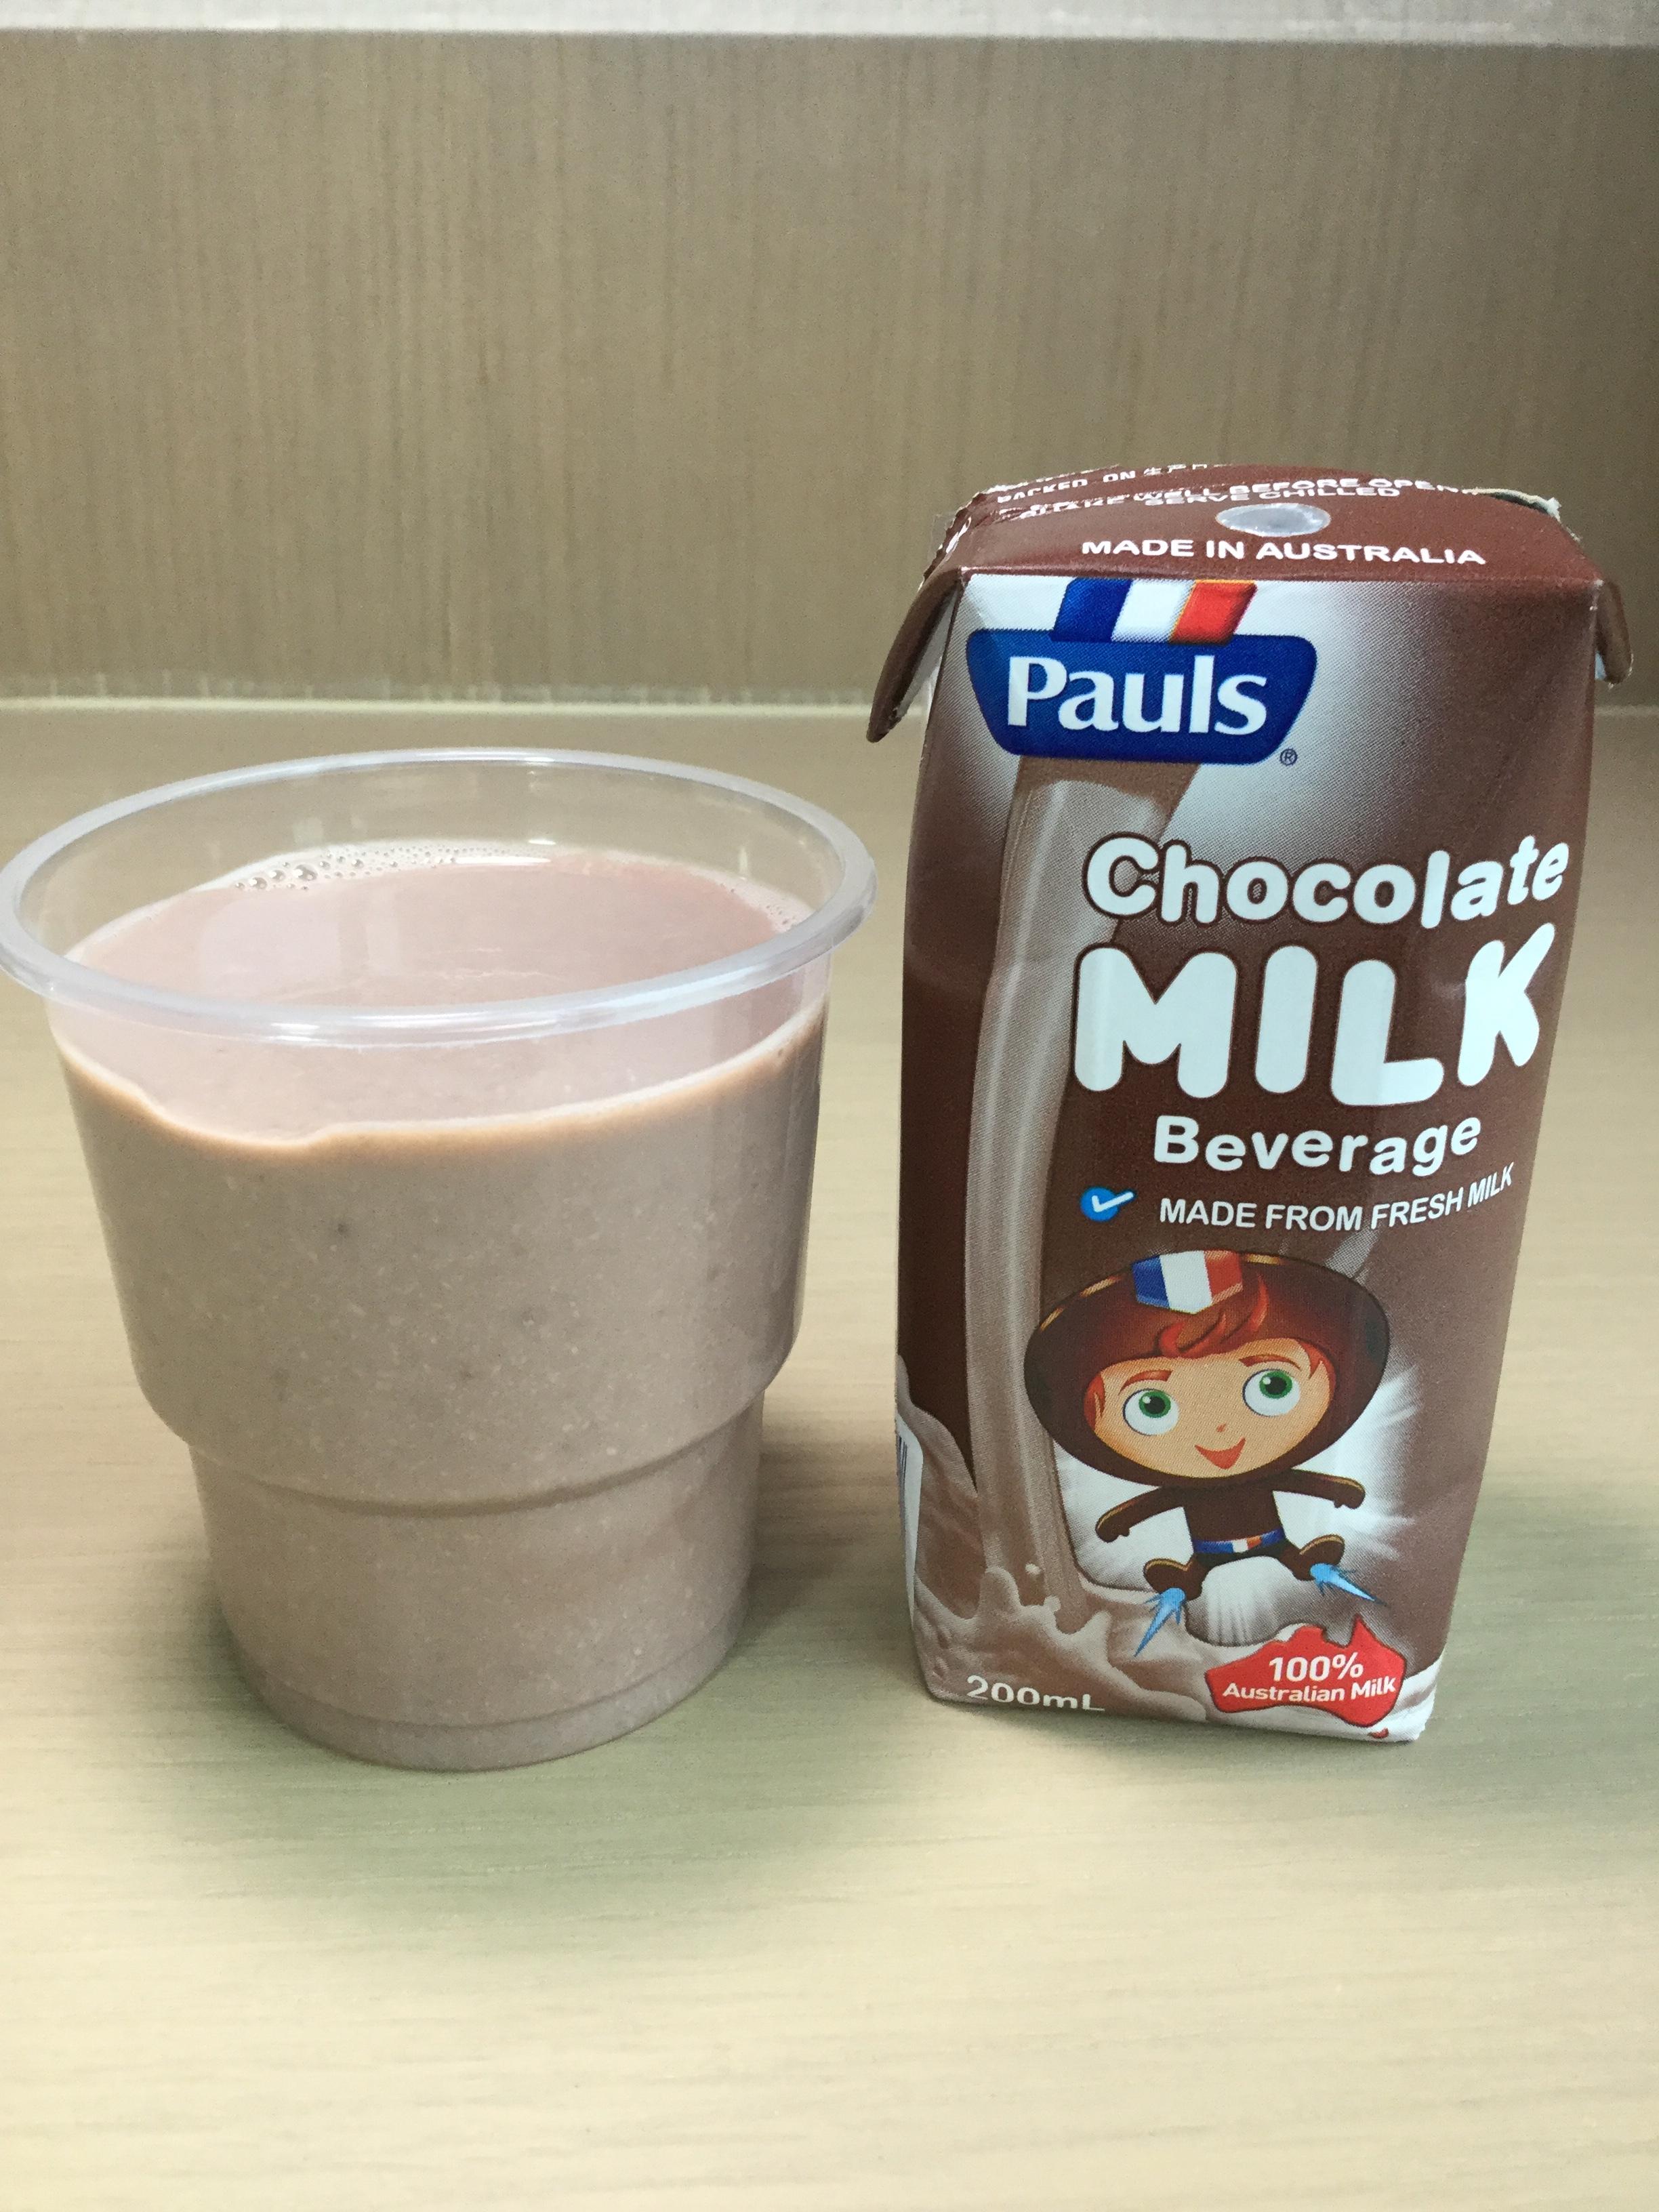 Pauls Chocolate Milk Beverage Cup